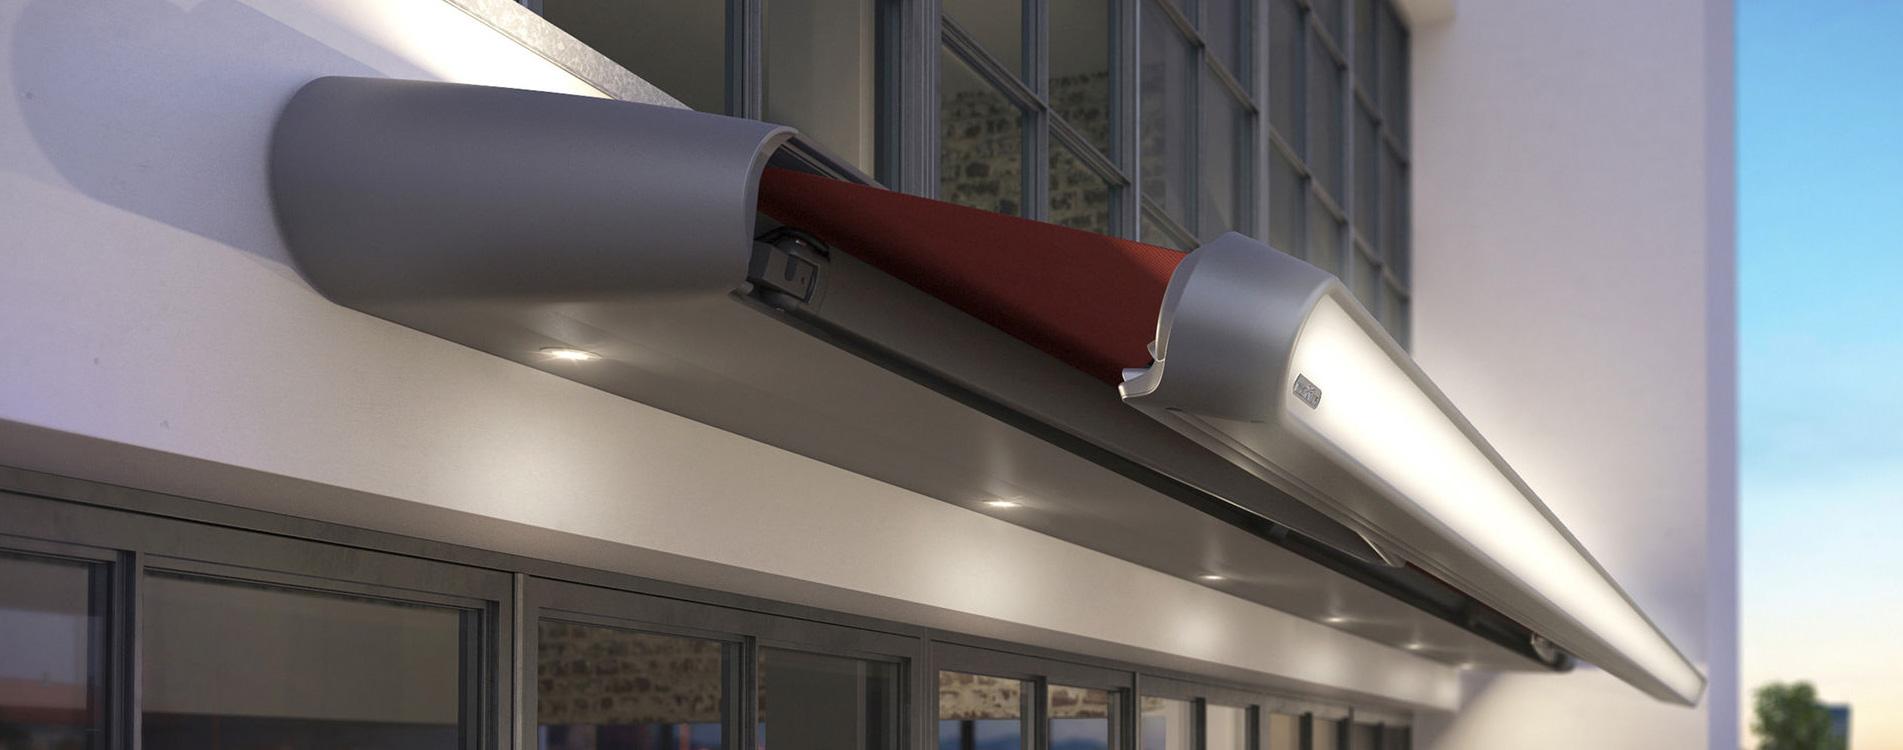 Markilux MX-1 awnings